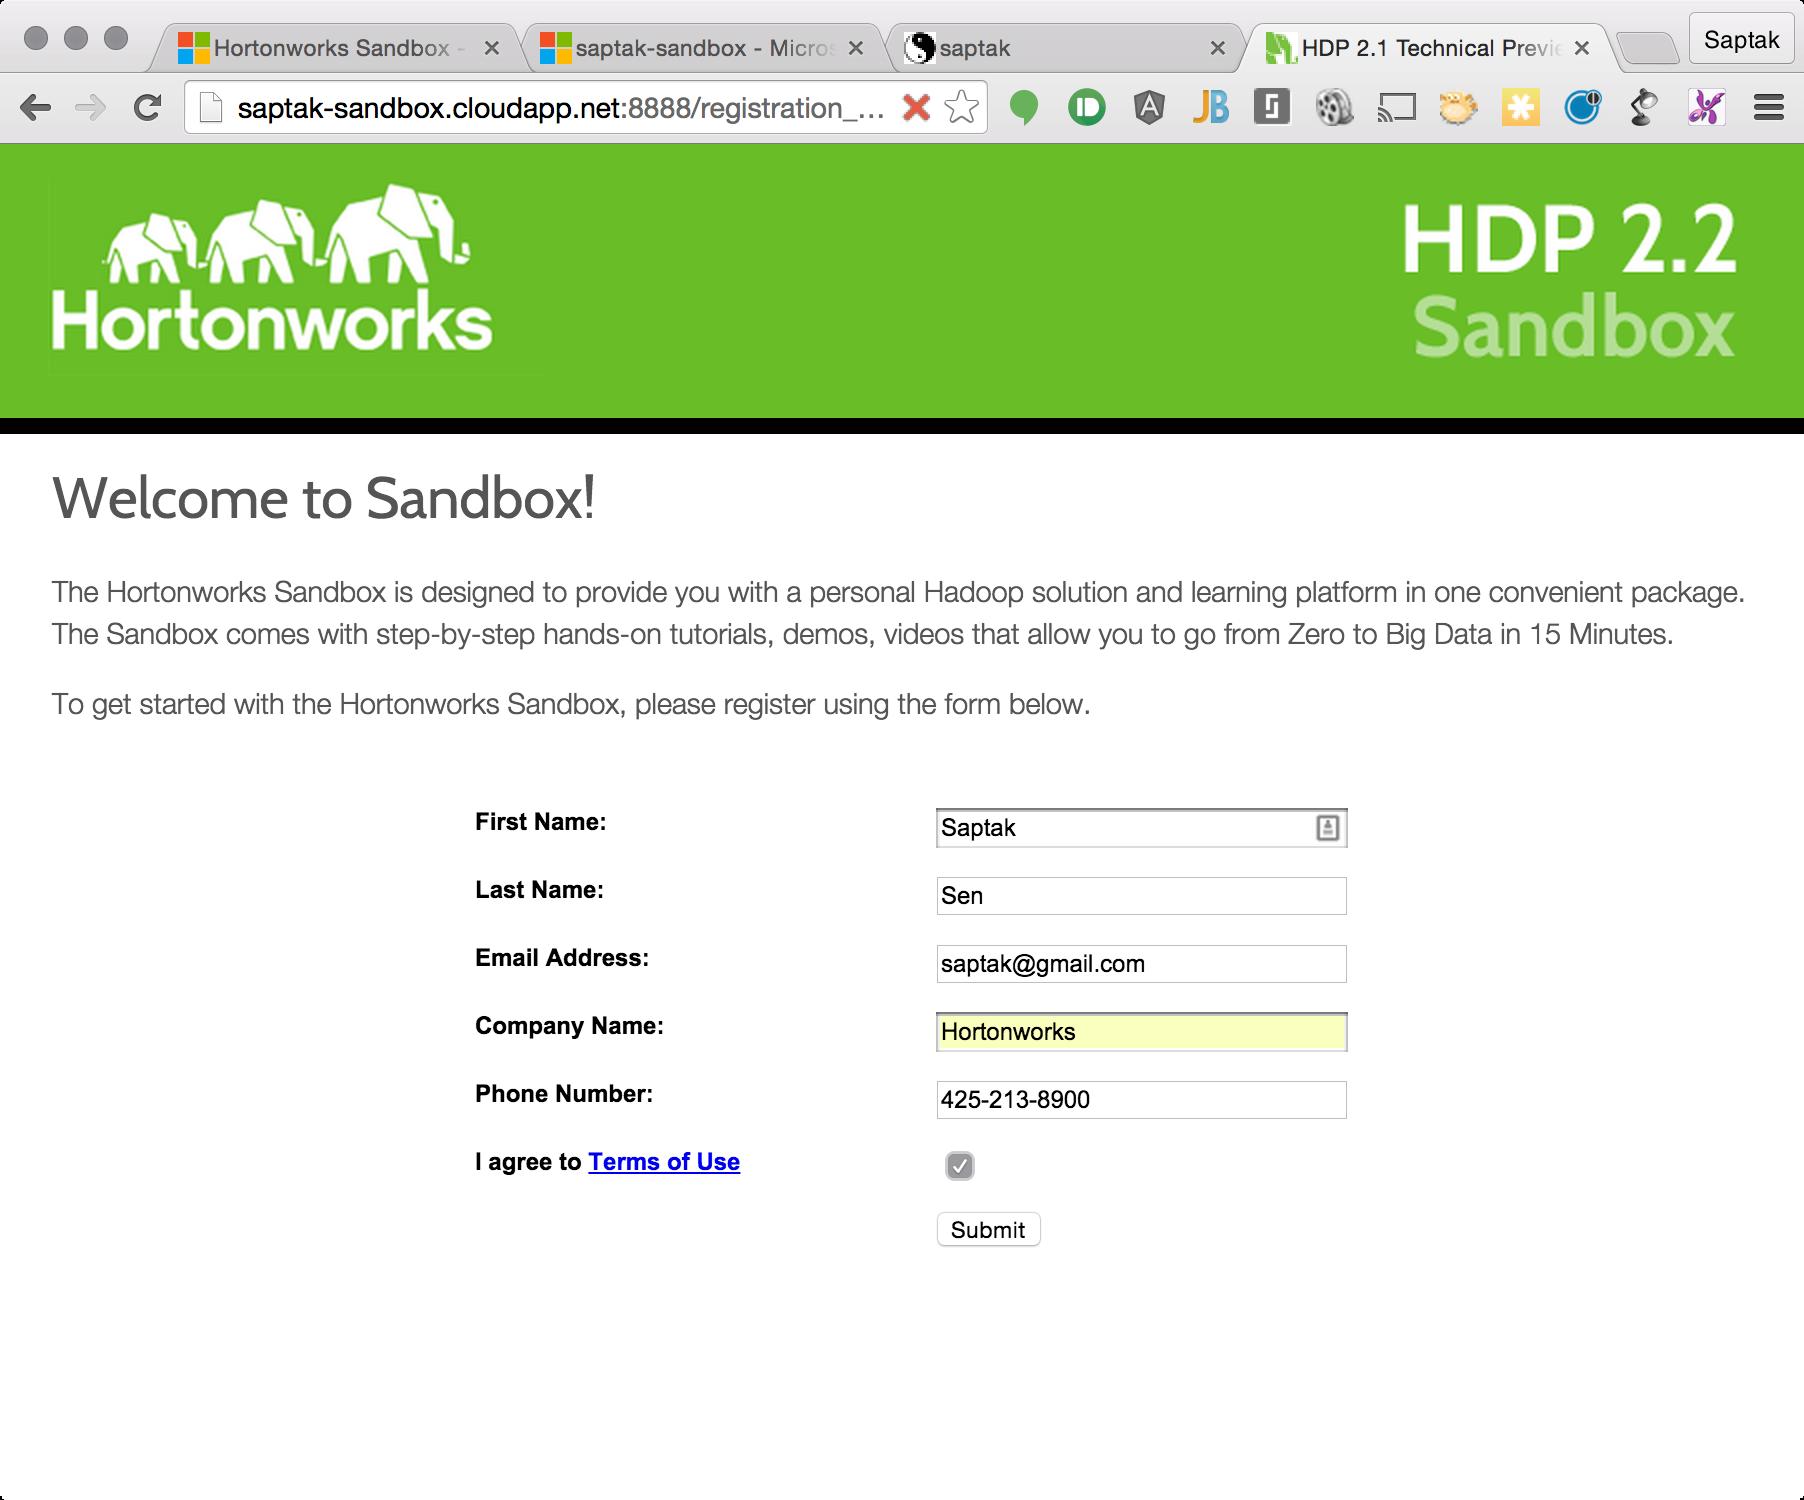 Getting Started with Hortonworks Sandbox on Azure - Hortonworks